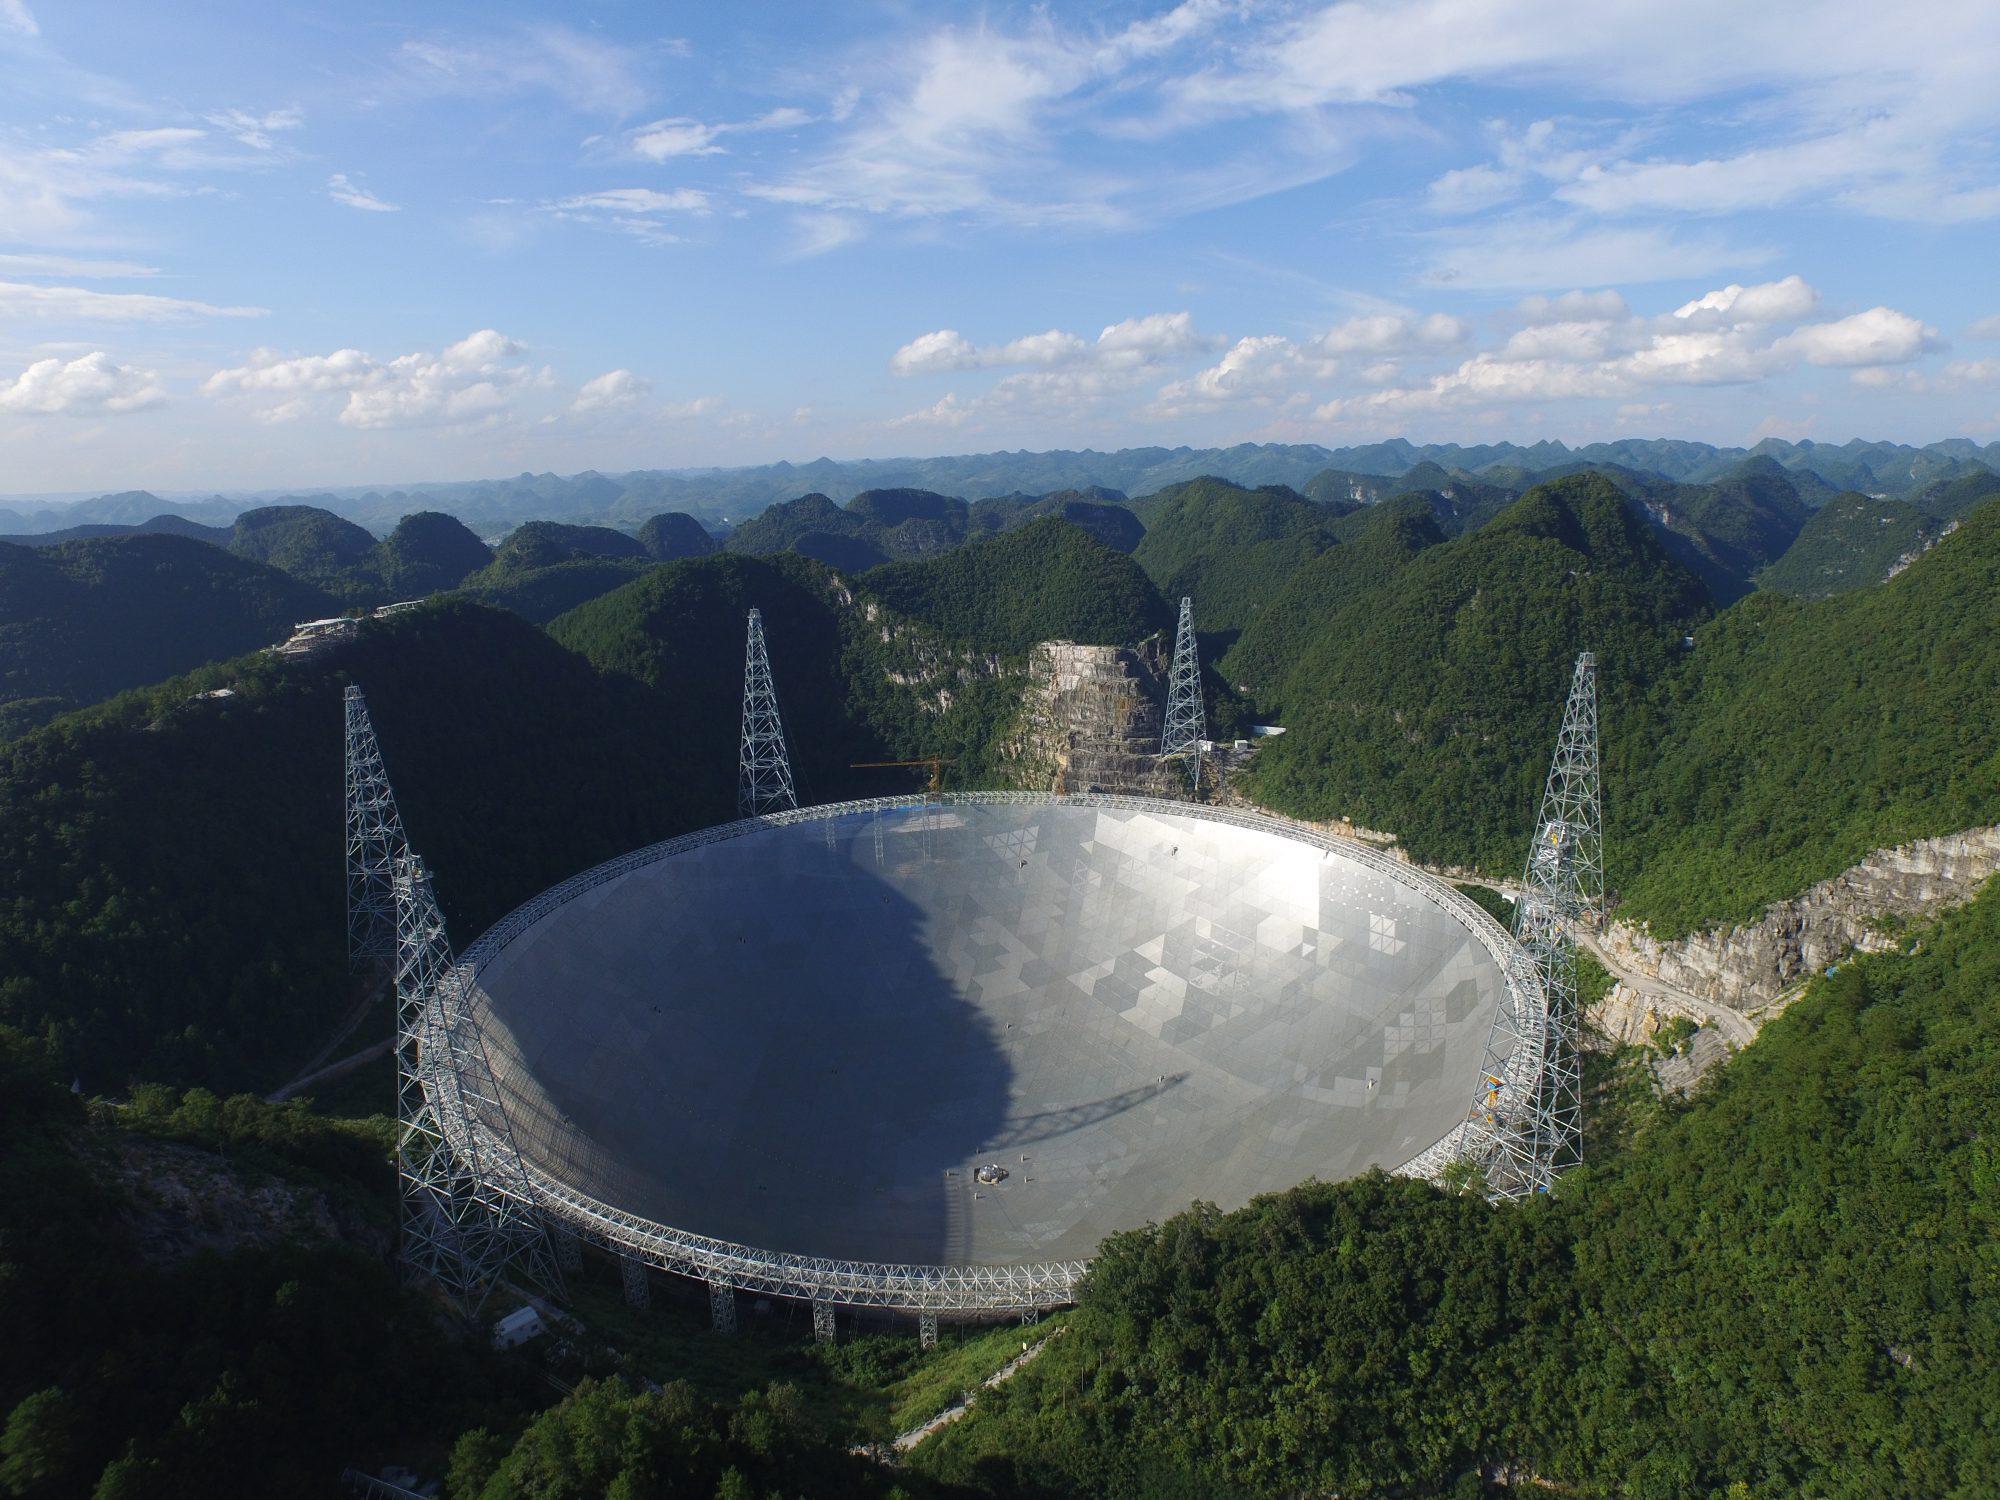 Data Driven Astronomy Education and Public Outreach (DAEPO)